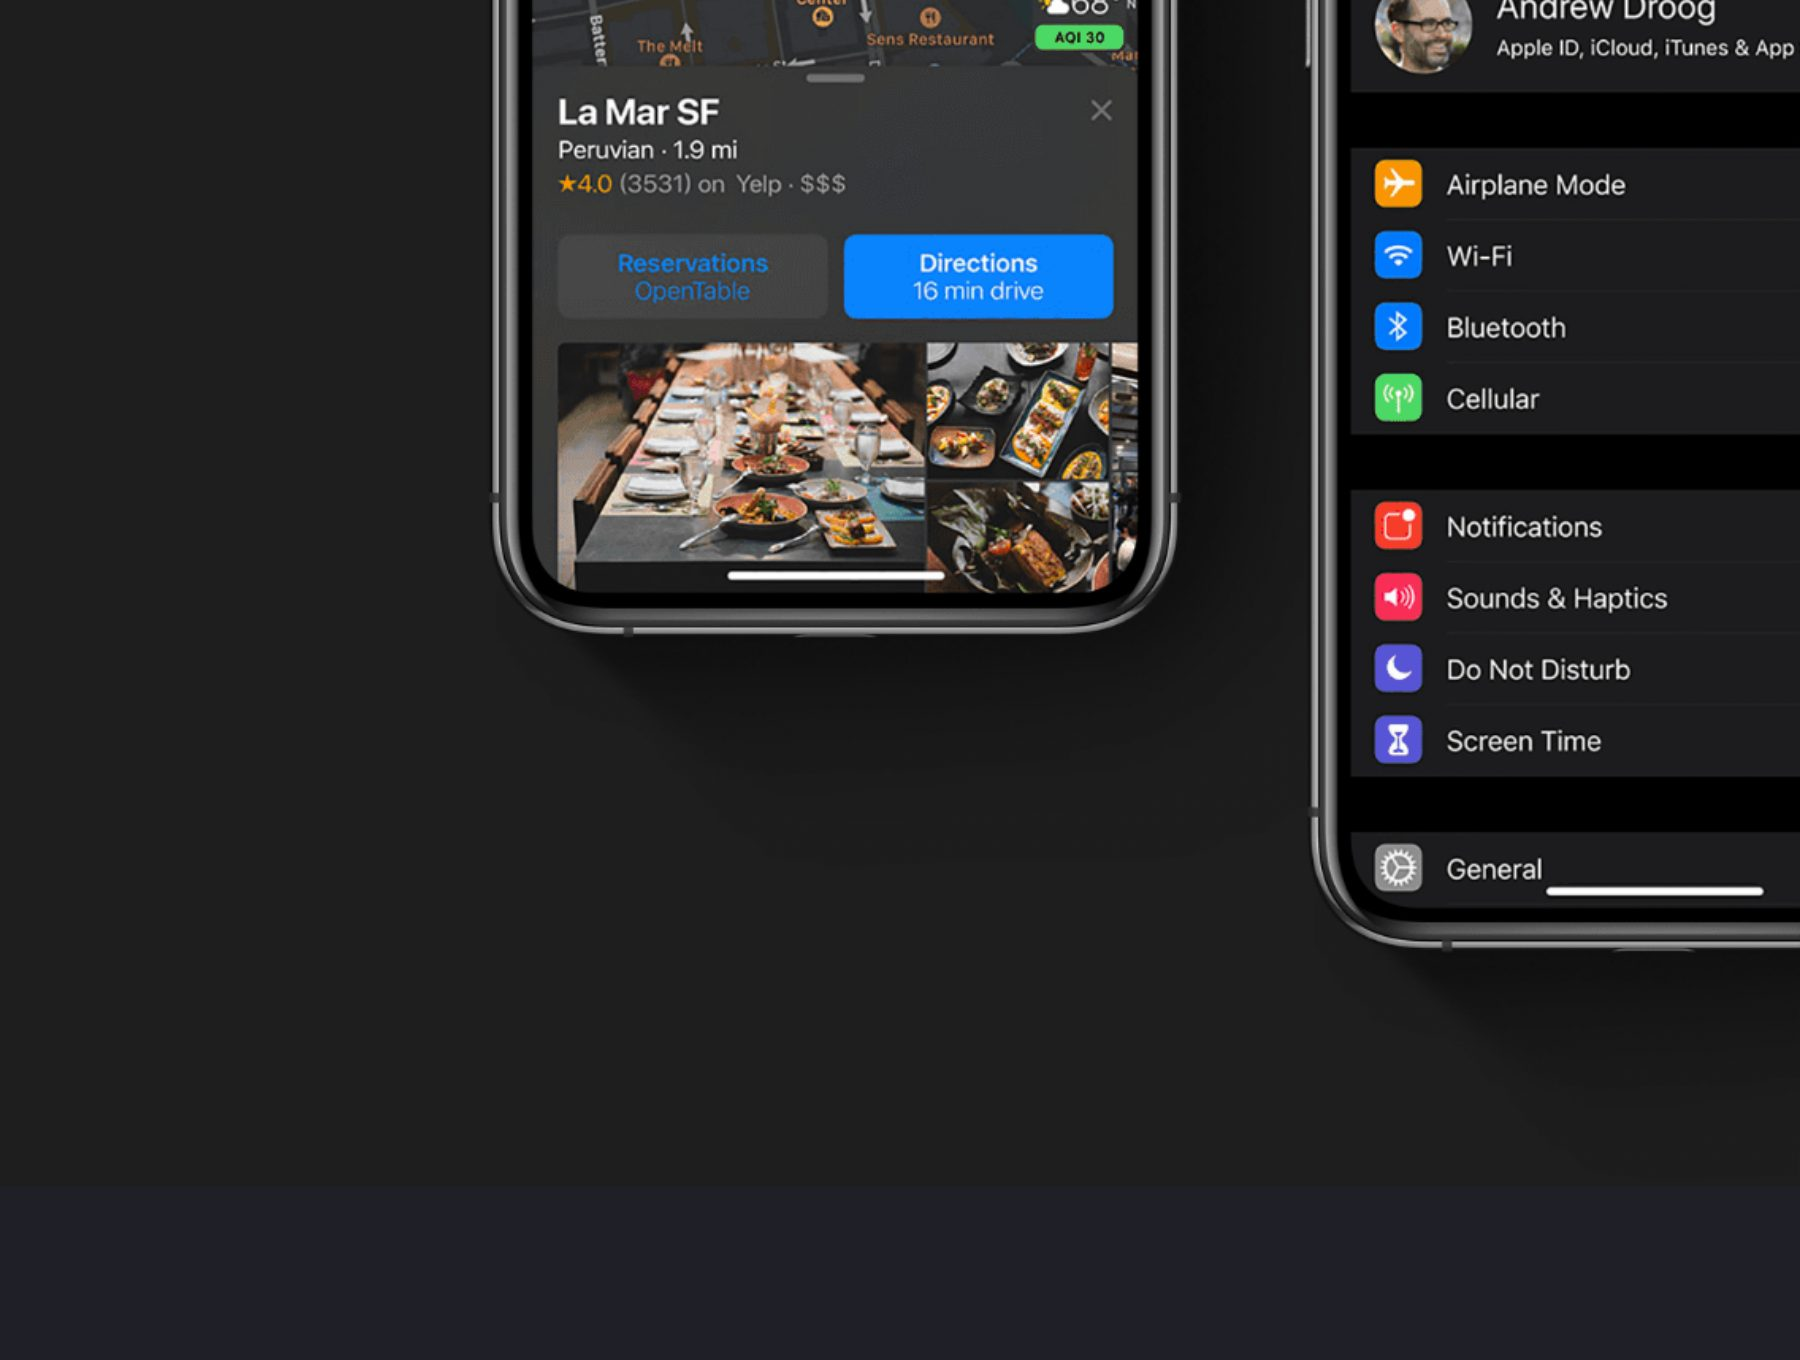 最新的 iOS 13 GUI KITS 套装下载[Sketch,XD,Fig] iOS13 GUI KIT FULL Version